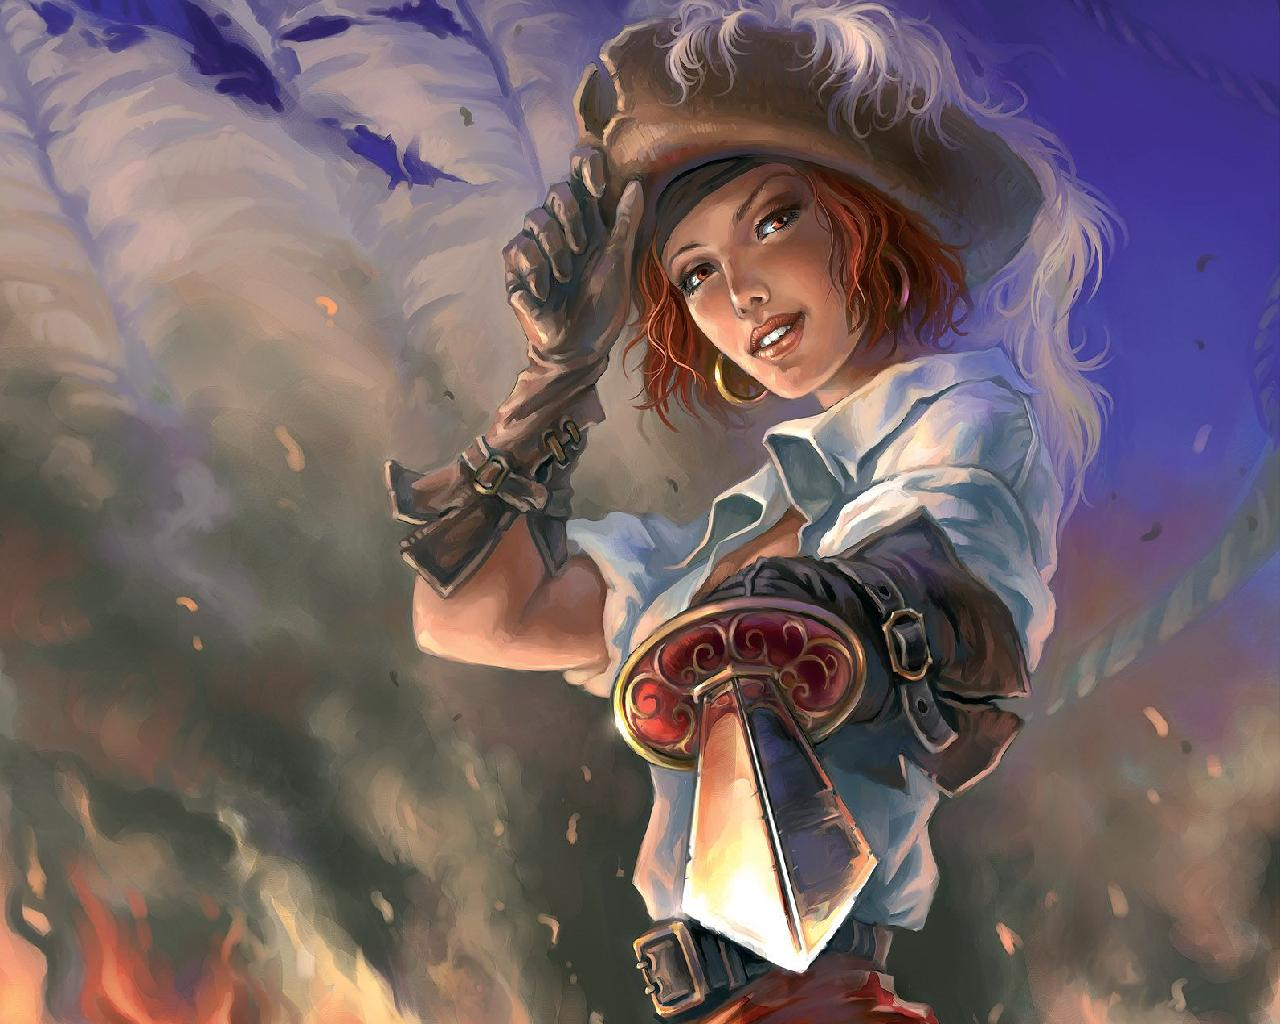 Pirate art id 74463 art abyss - Anime pirate wallpaper ...